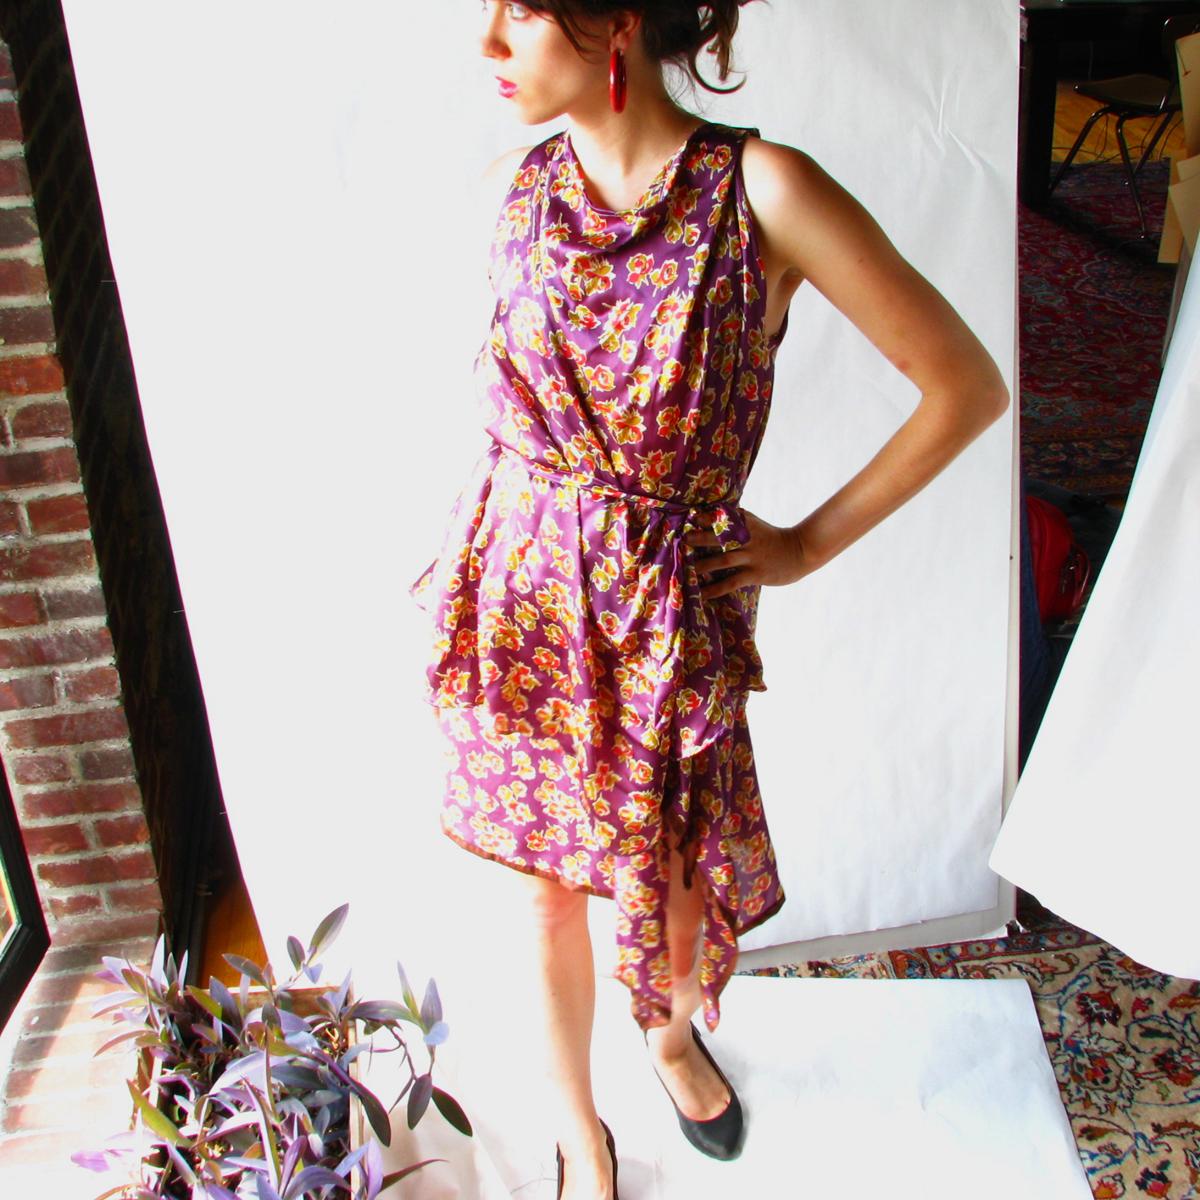 los-angeles-dress-silk-set_3773251024_o.jpg